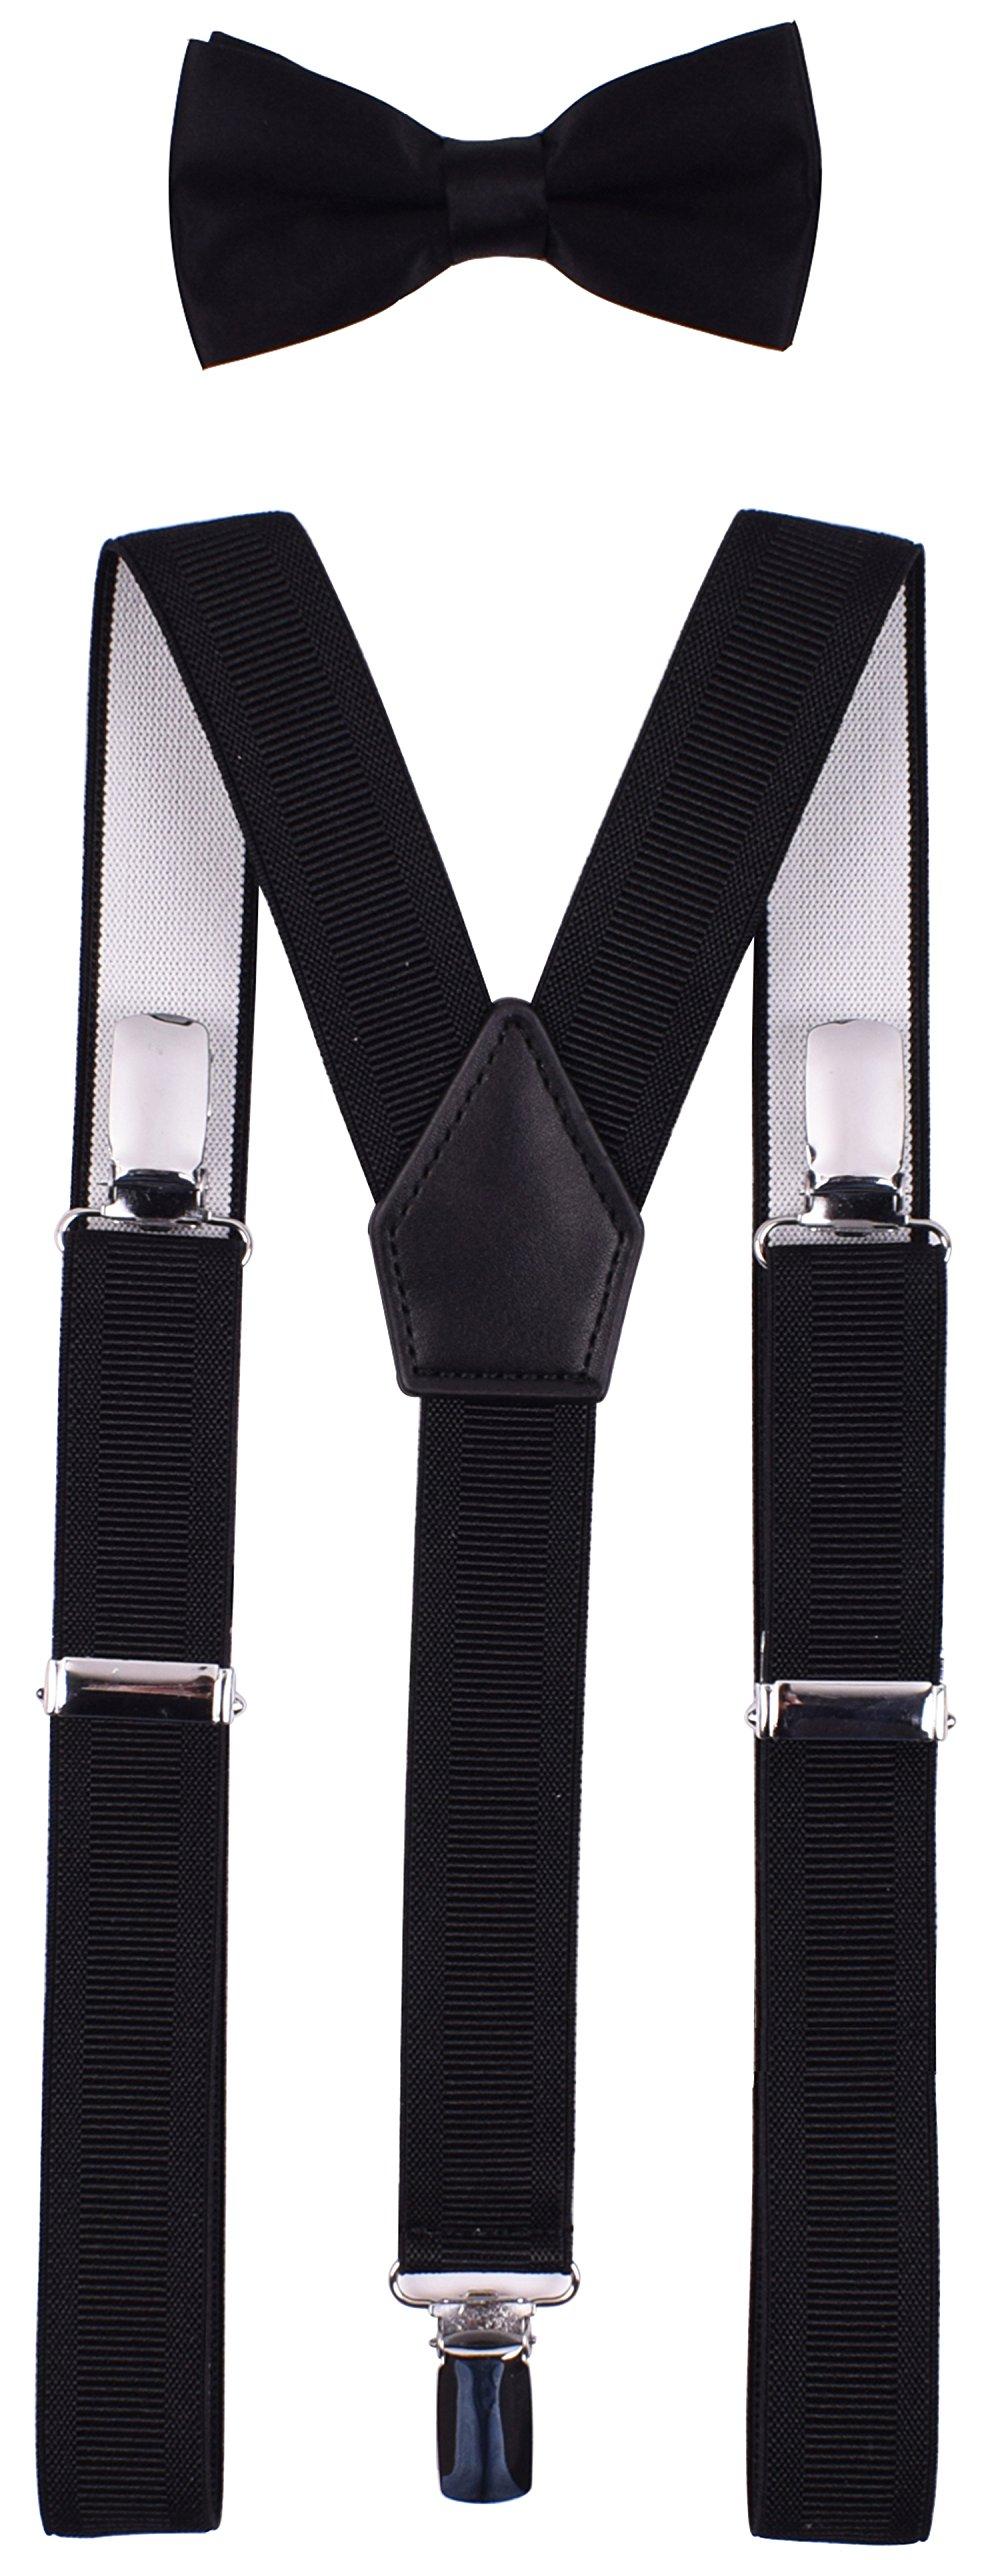 YJDS Kids Suspender Bowtie Sets Classic Y Back